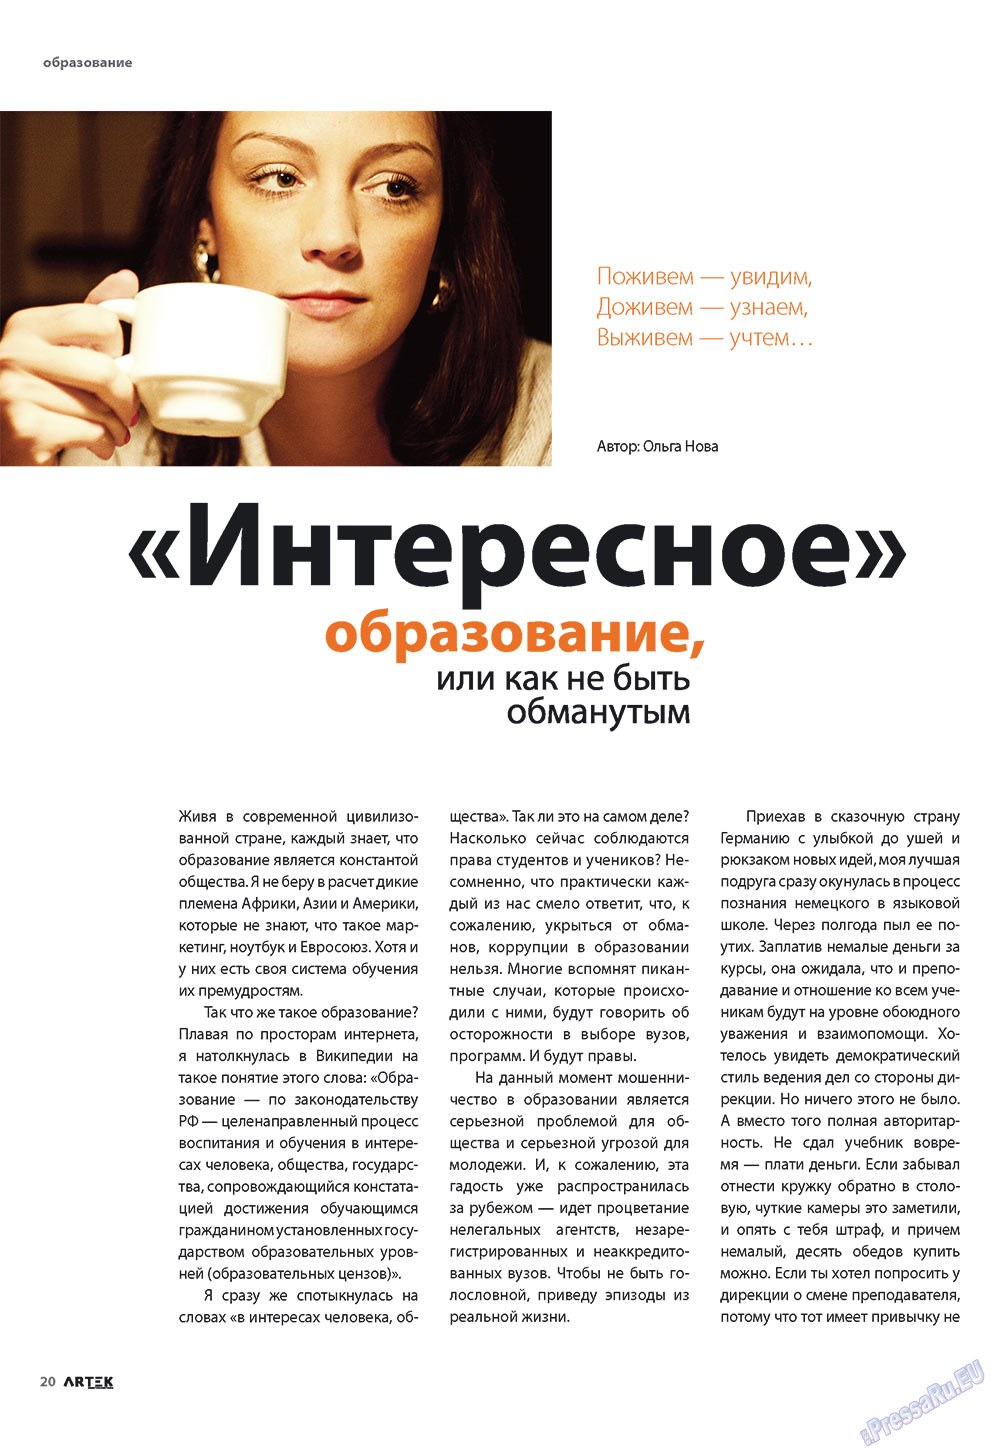 Артек (журнал). 2009 год, номер 4, стр. 20